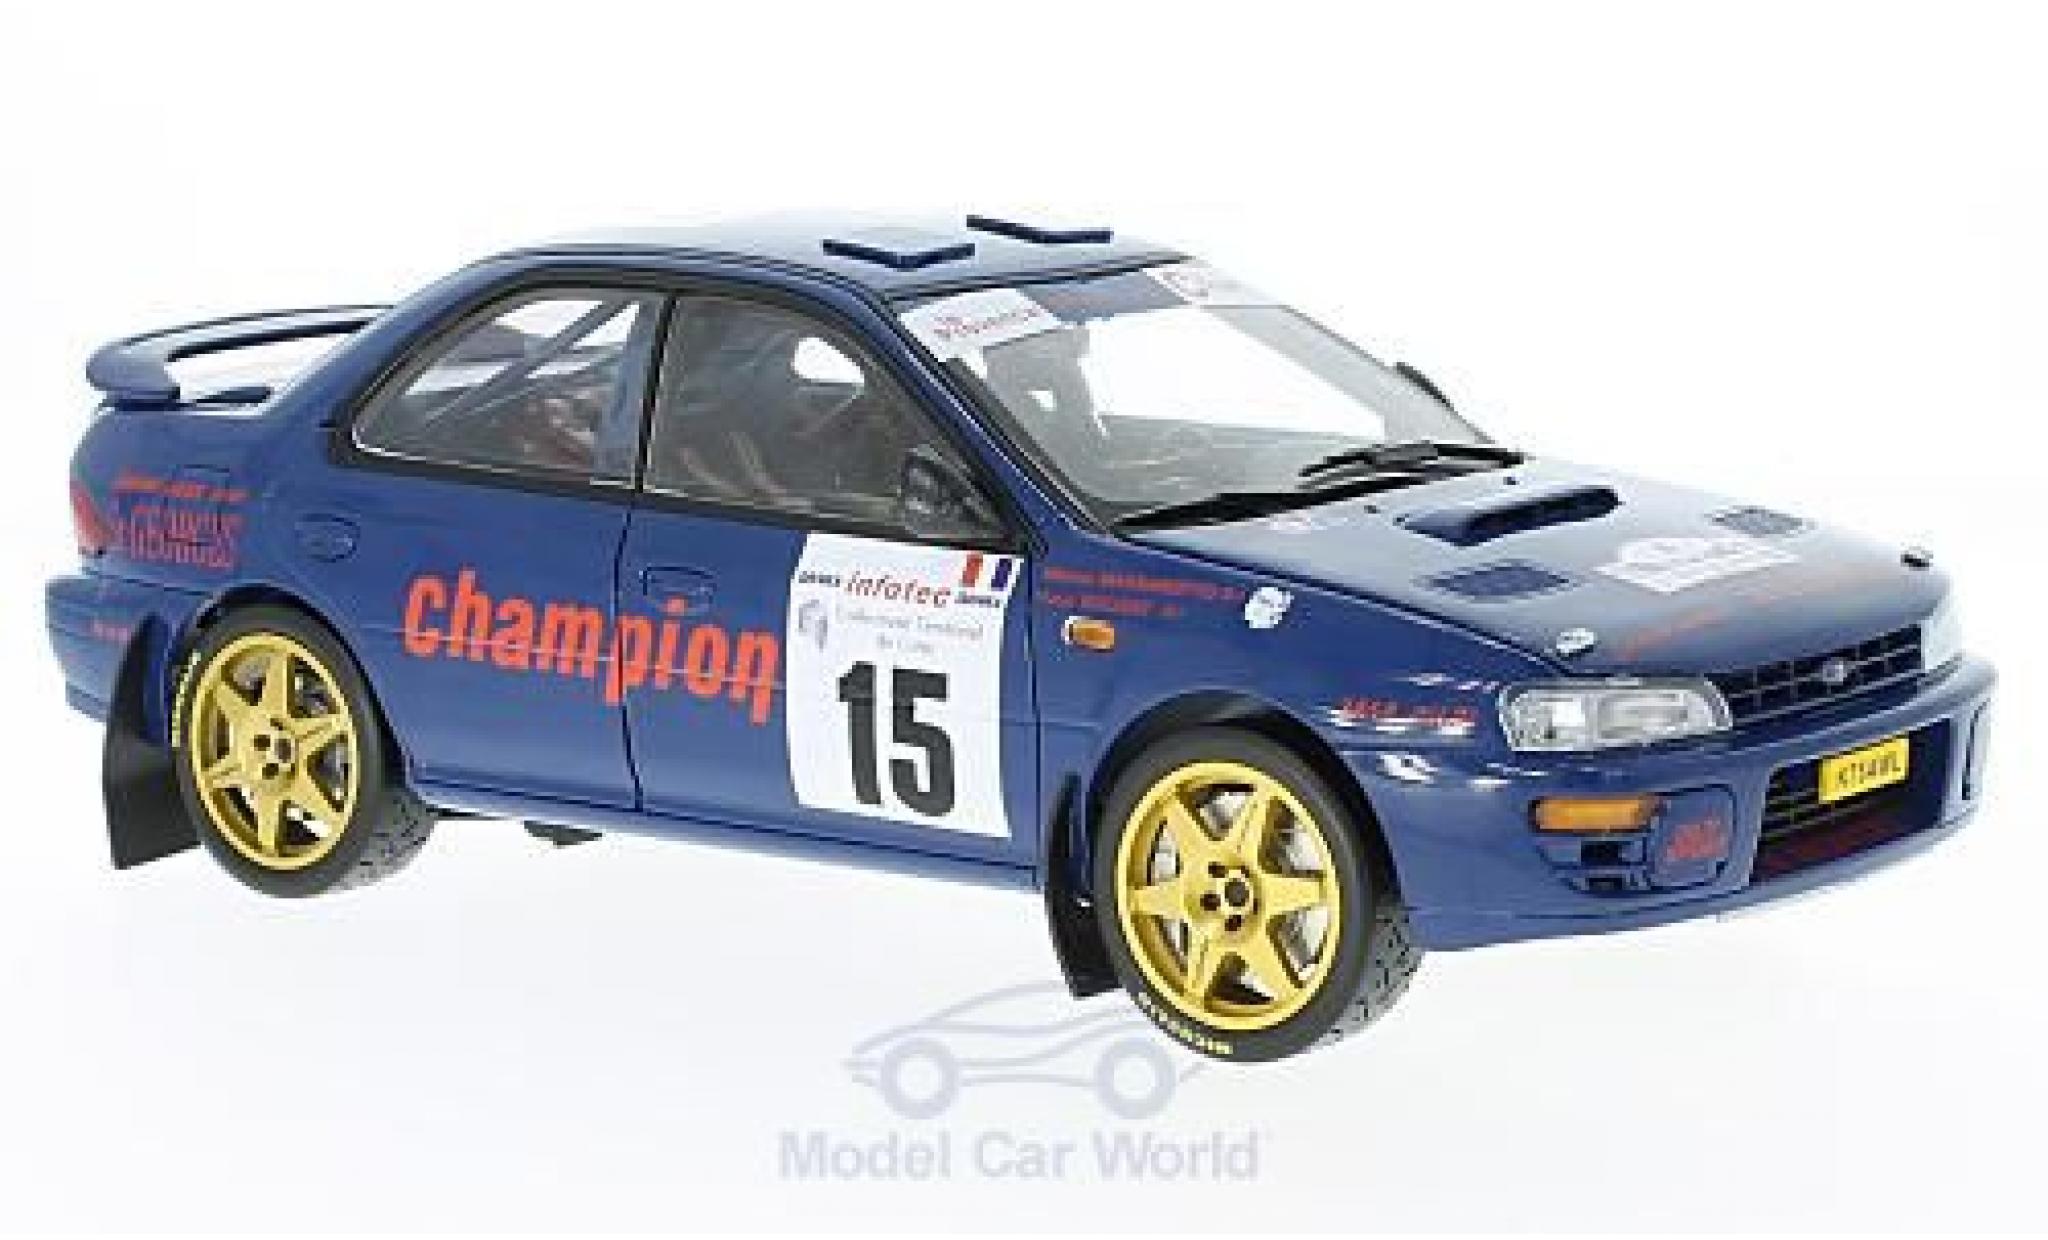 Subaru Impreza 555 1/18 Sun Star 555 No.15 Tour de Corse 1996 M.Massarougeto/Y.Bouzat